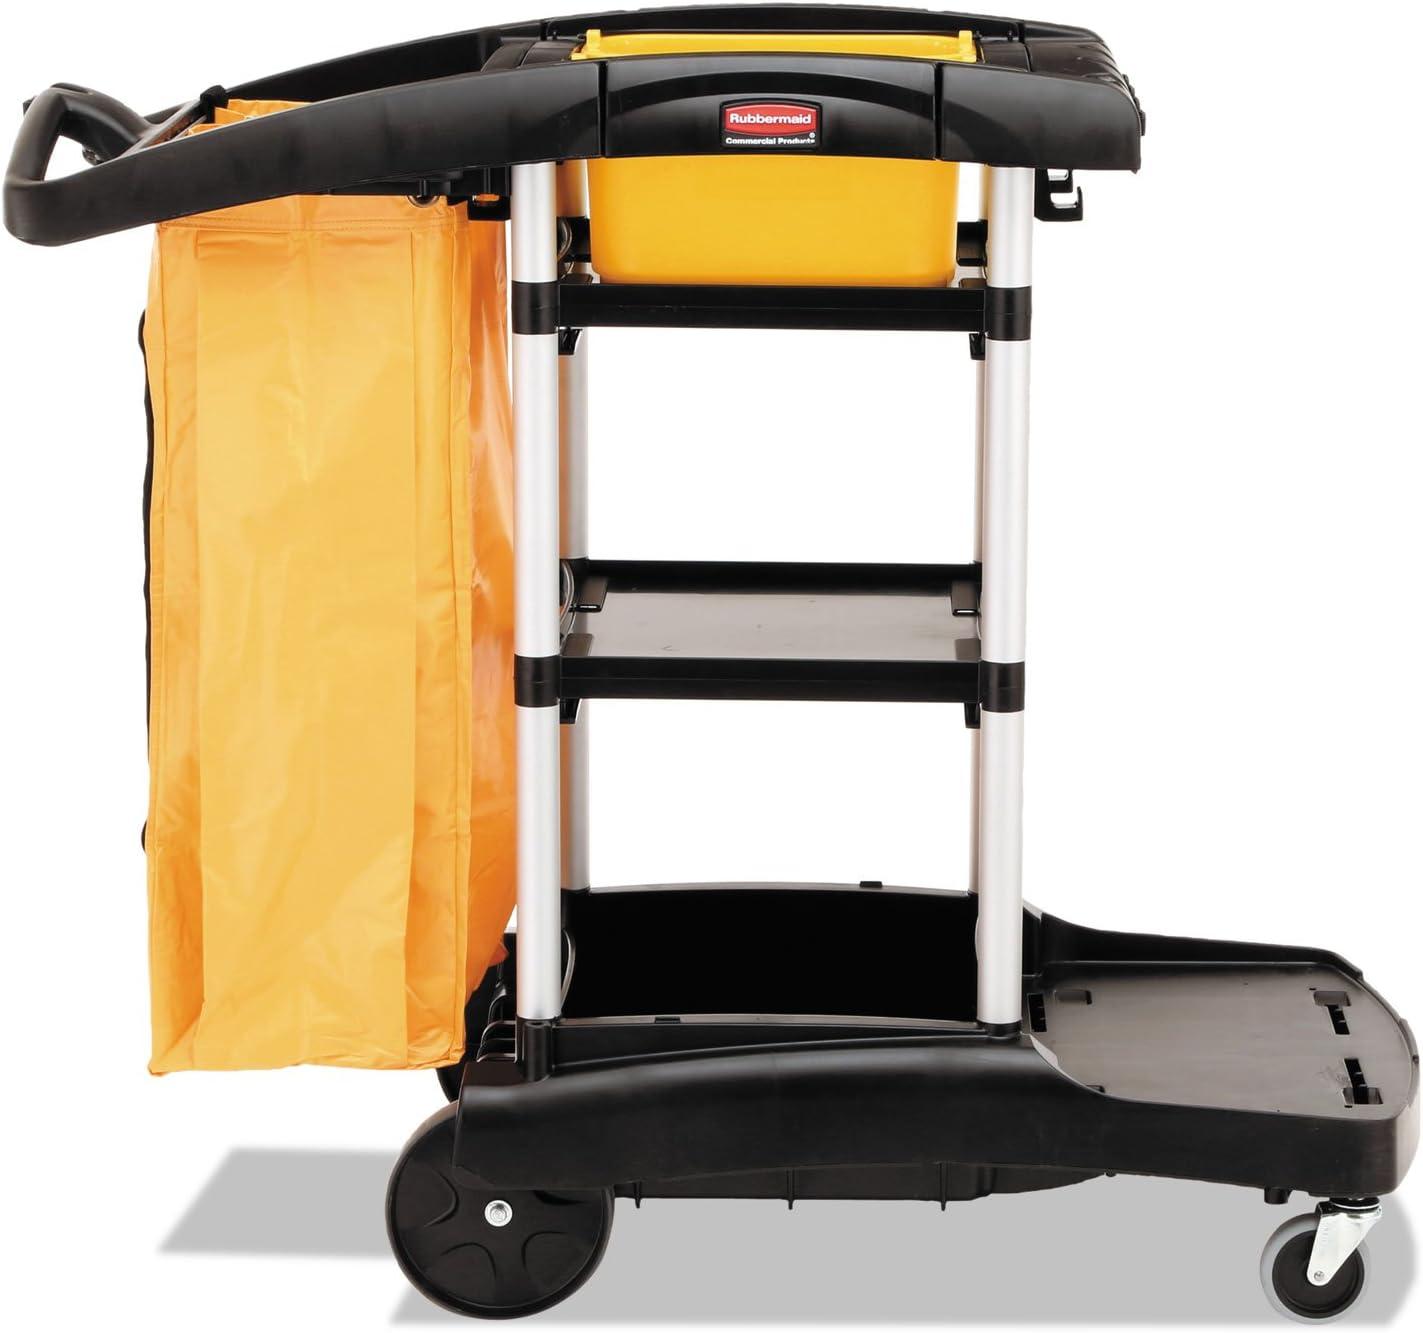 Rubbermaid 9T7200BK High Capacity Cleaning Cart, 21-3/4w x 49-3/4d x 38-3/8h, Black